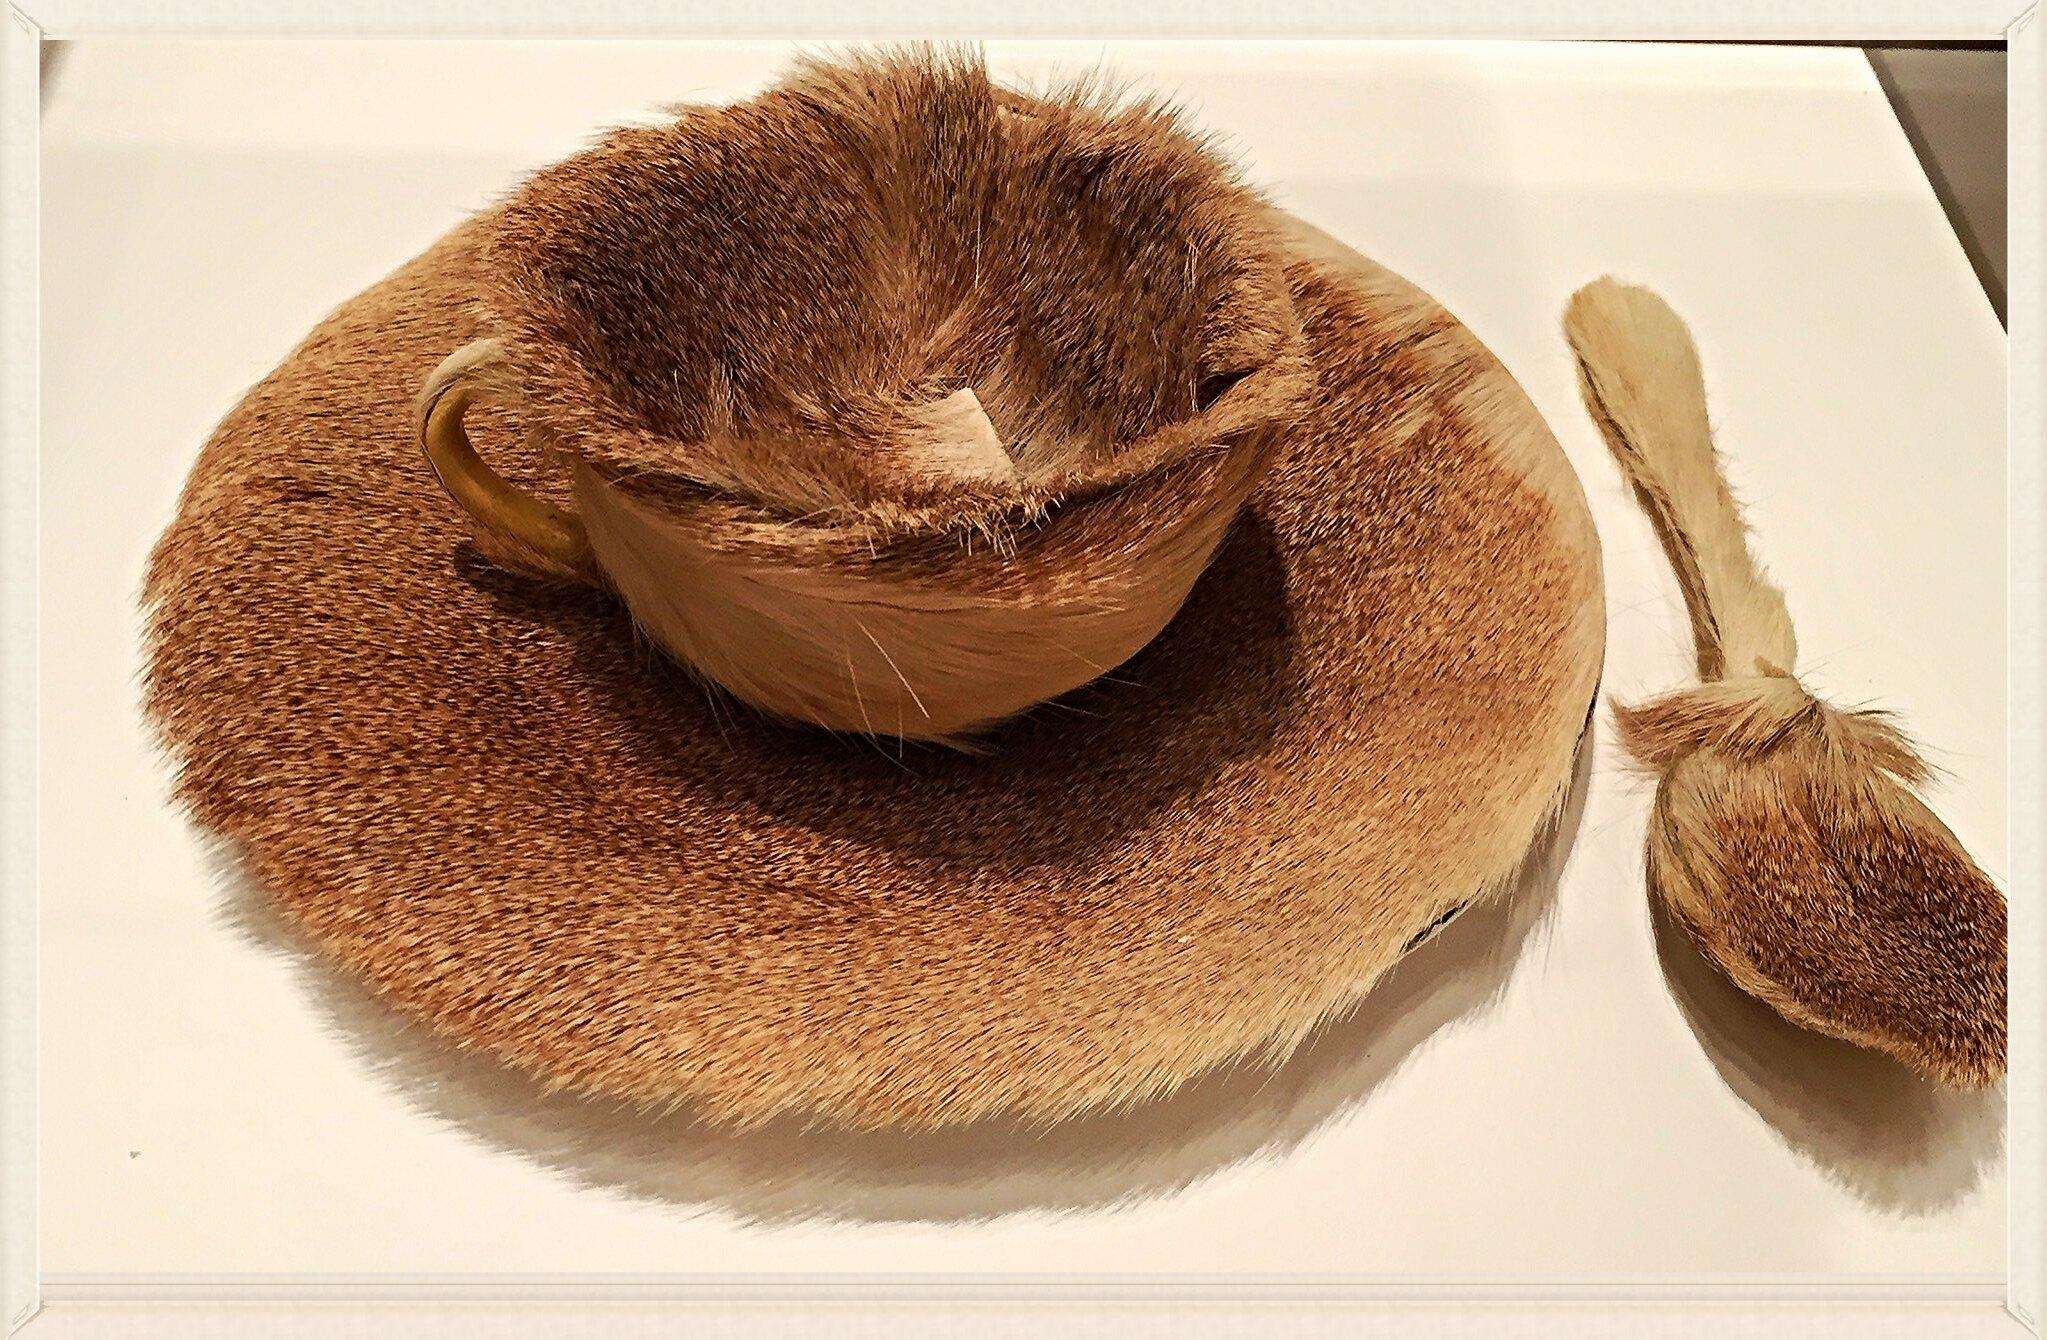 Furry teacup